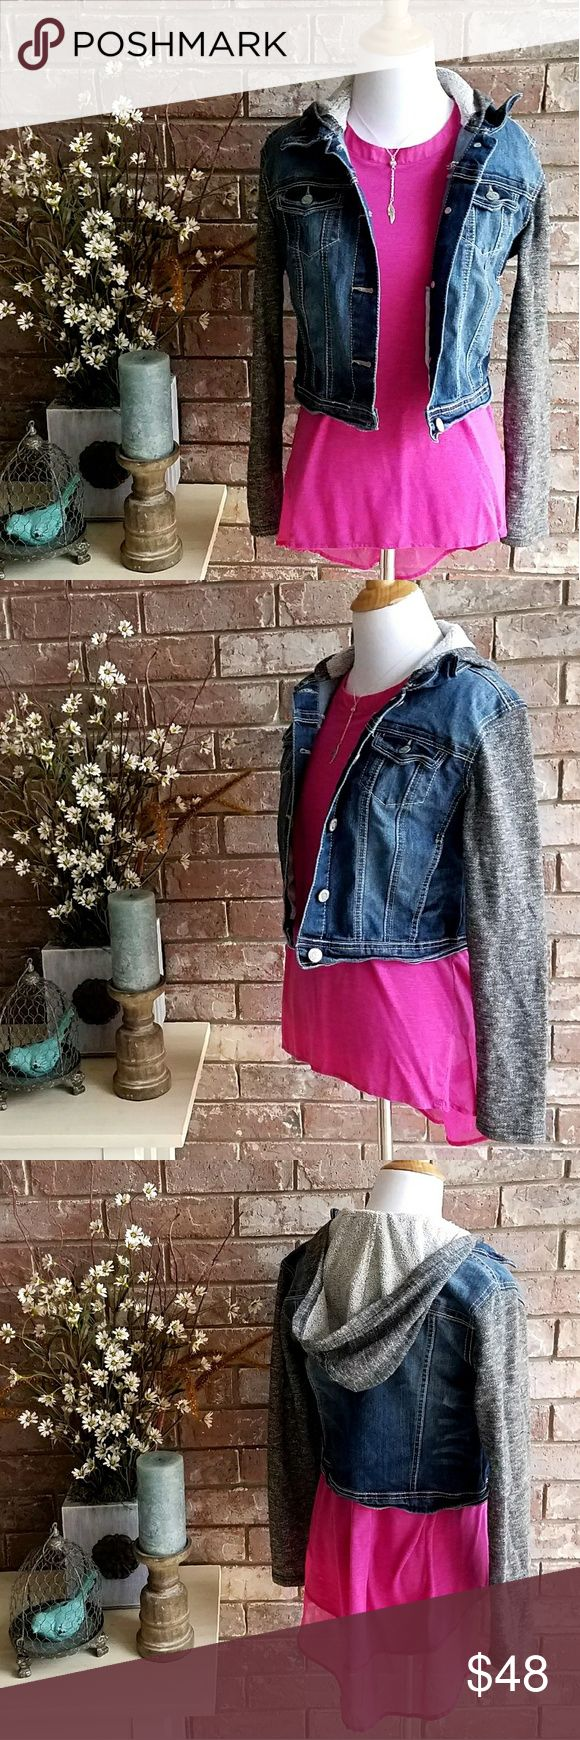 Hooded Jean Jacket Hooded Jean Jacket with black heathered knit fabric sleeves and hood. Wallflower Jackets & Coats Jean Jackets